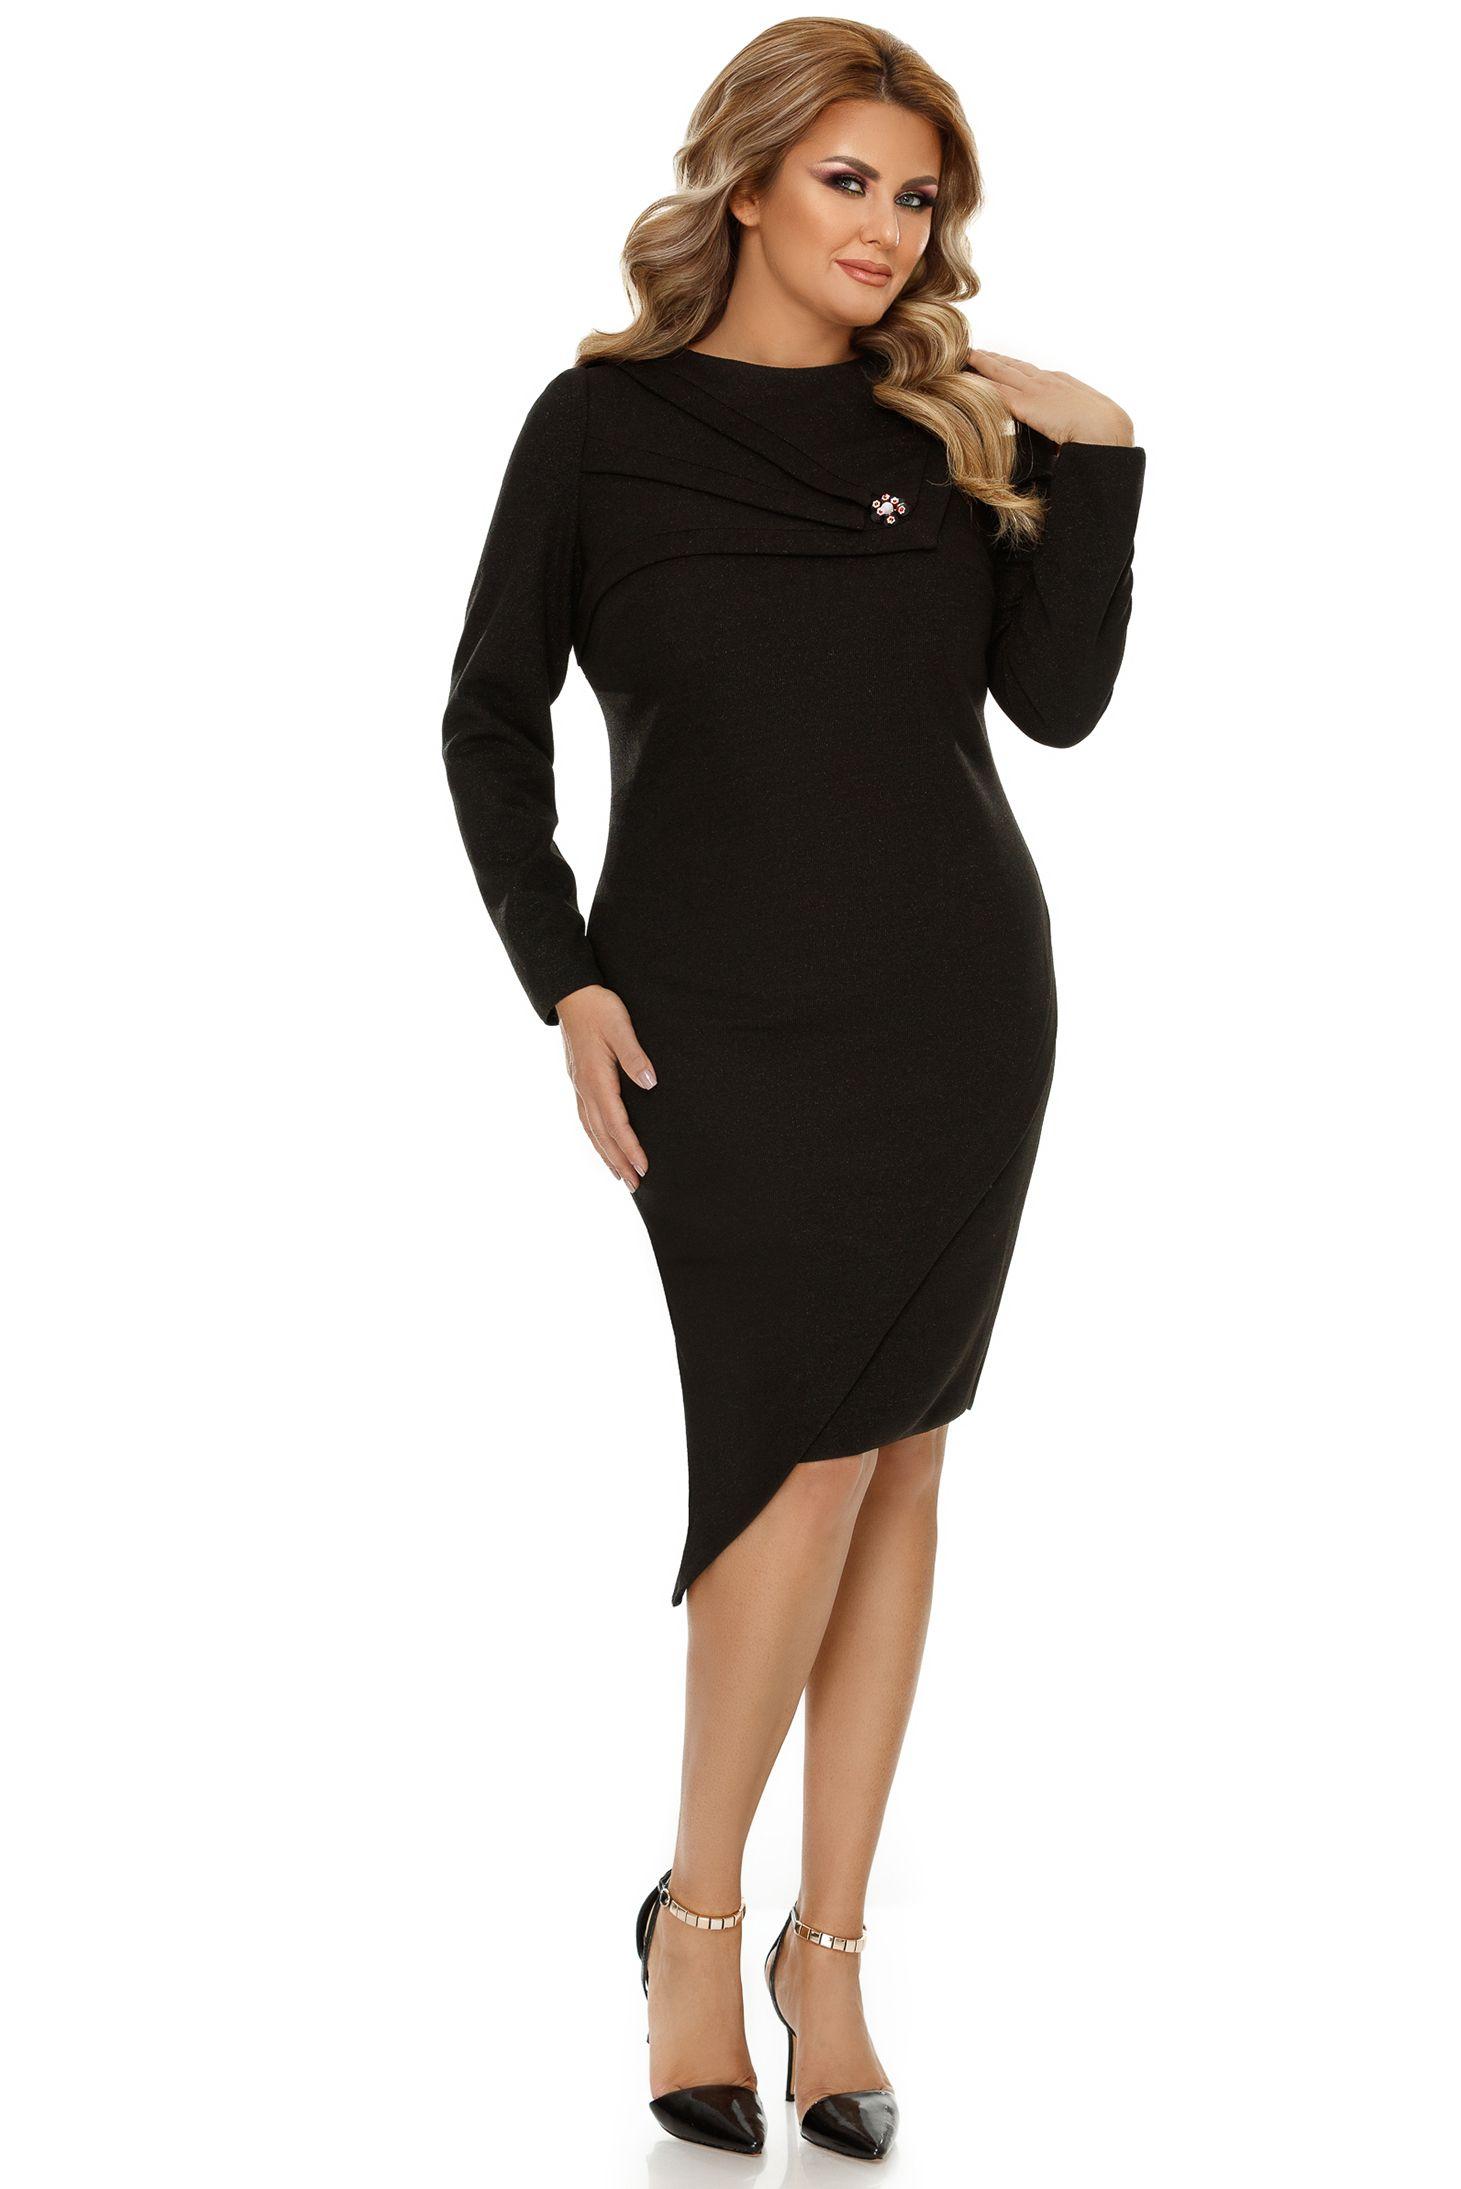 Black dress elegant asymmetrical slightly elastic fabric with tented